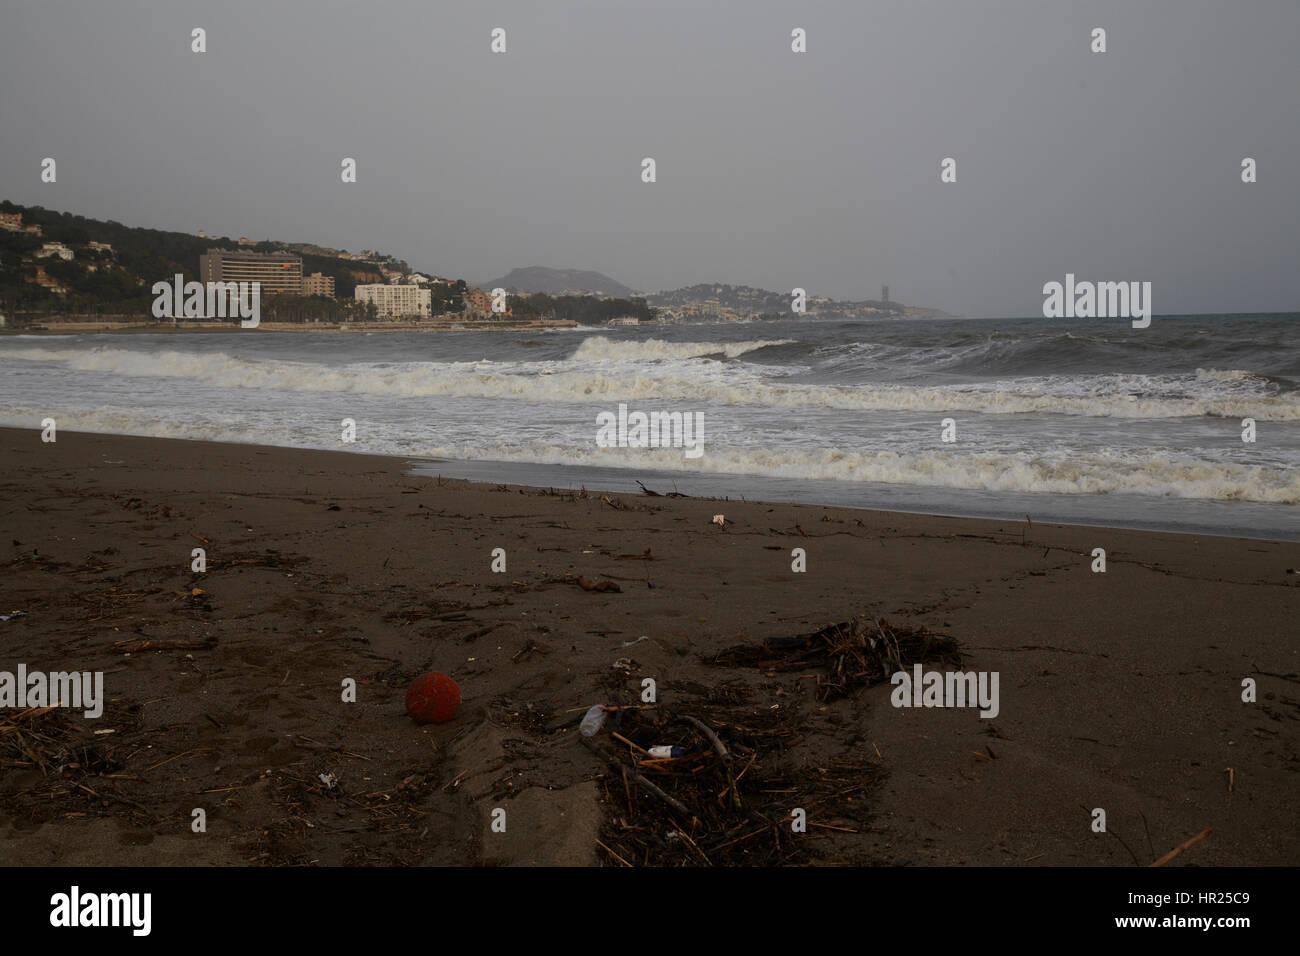 Malaga, Spain  skyline at Playa de la Malagueta - Stock Image